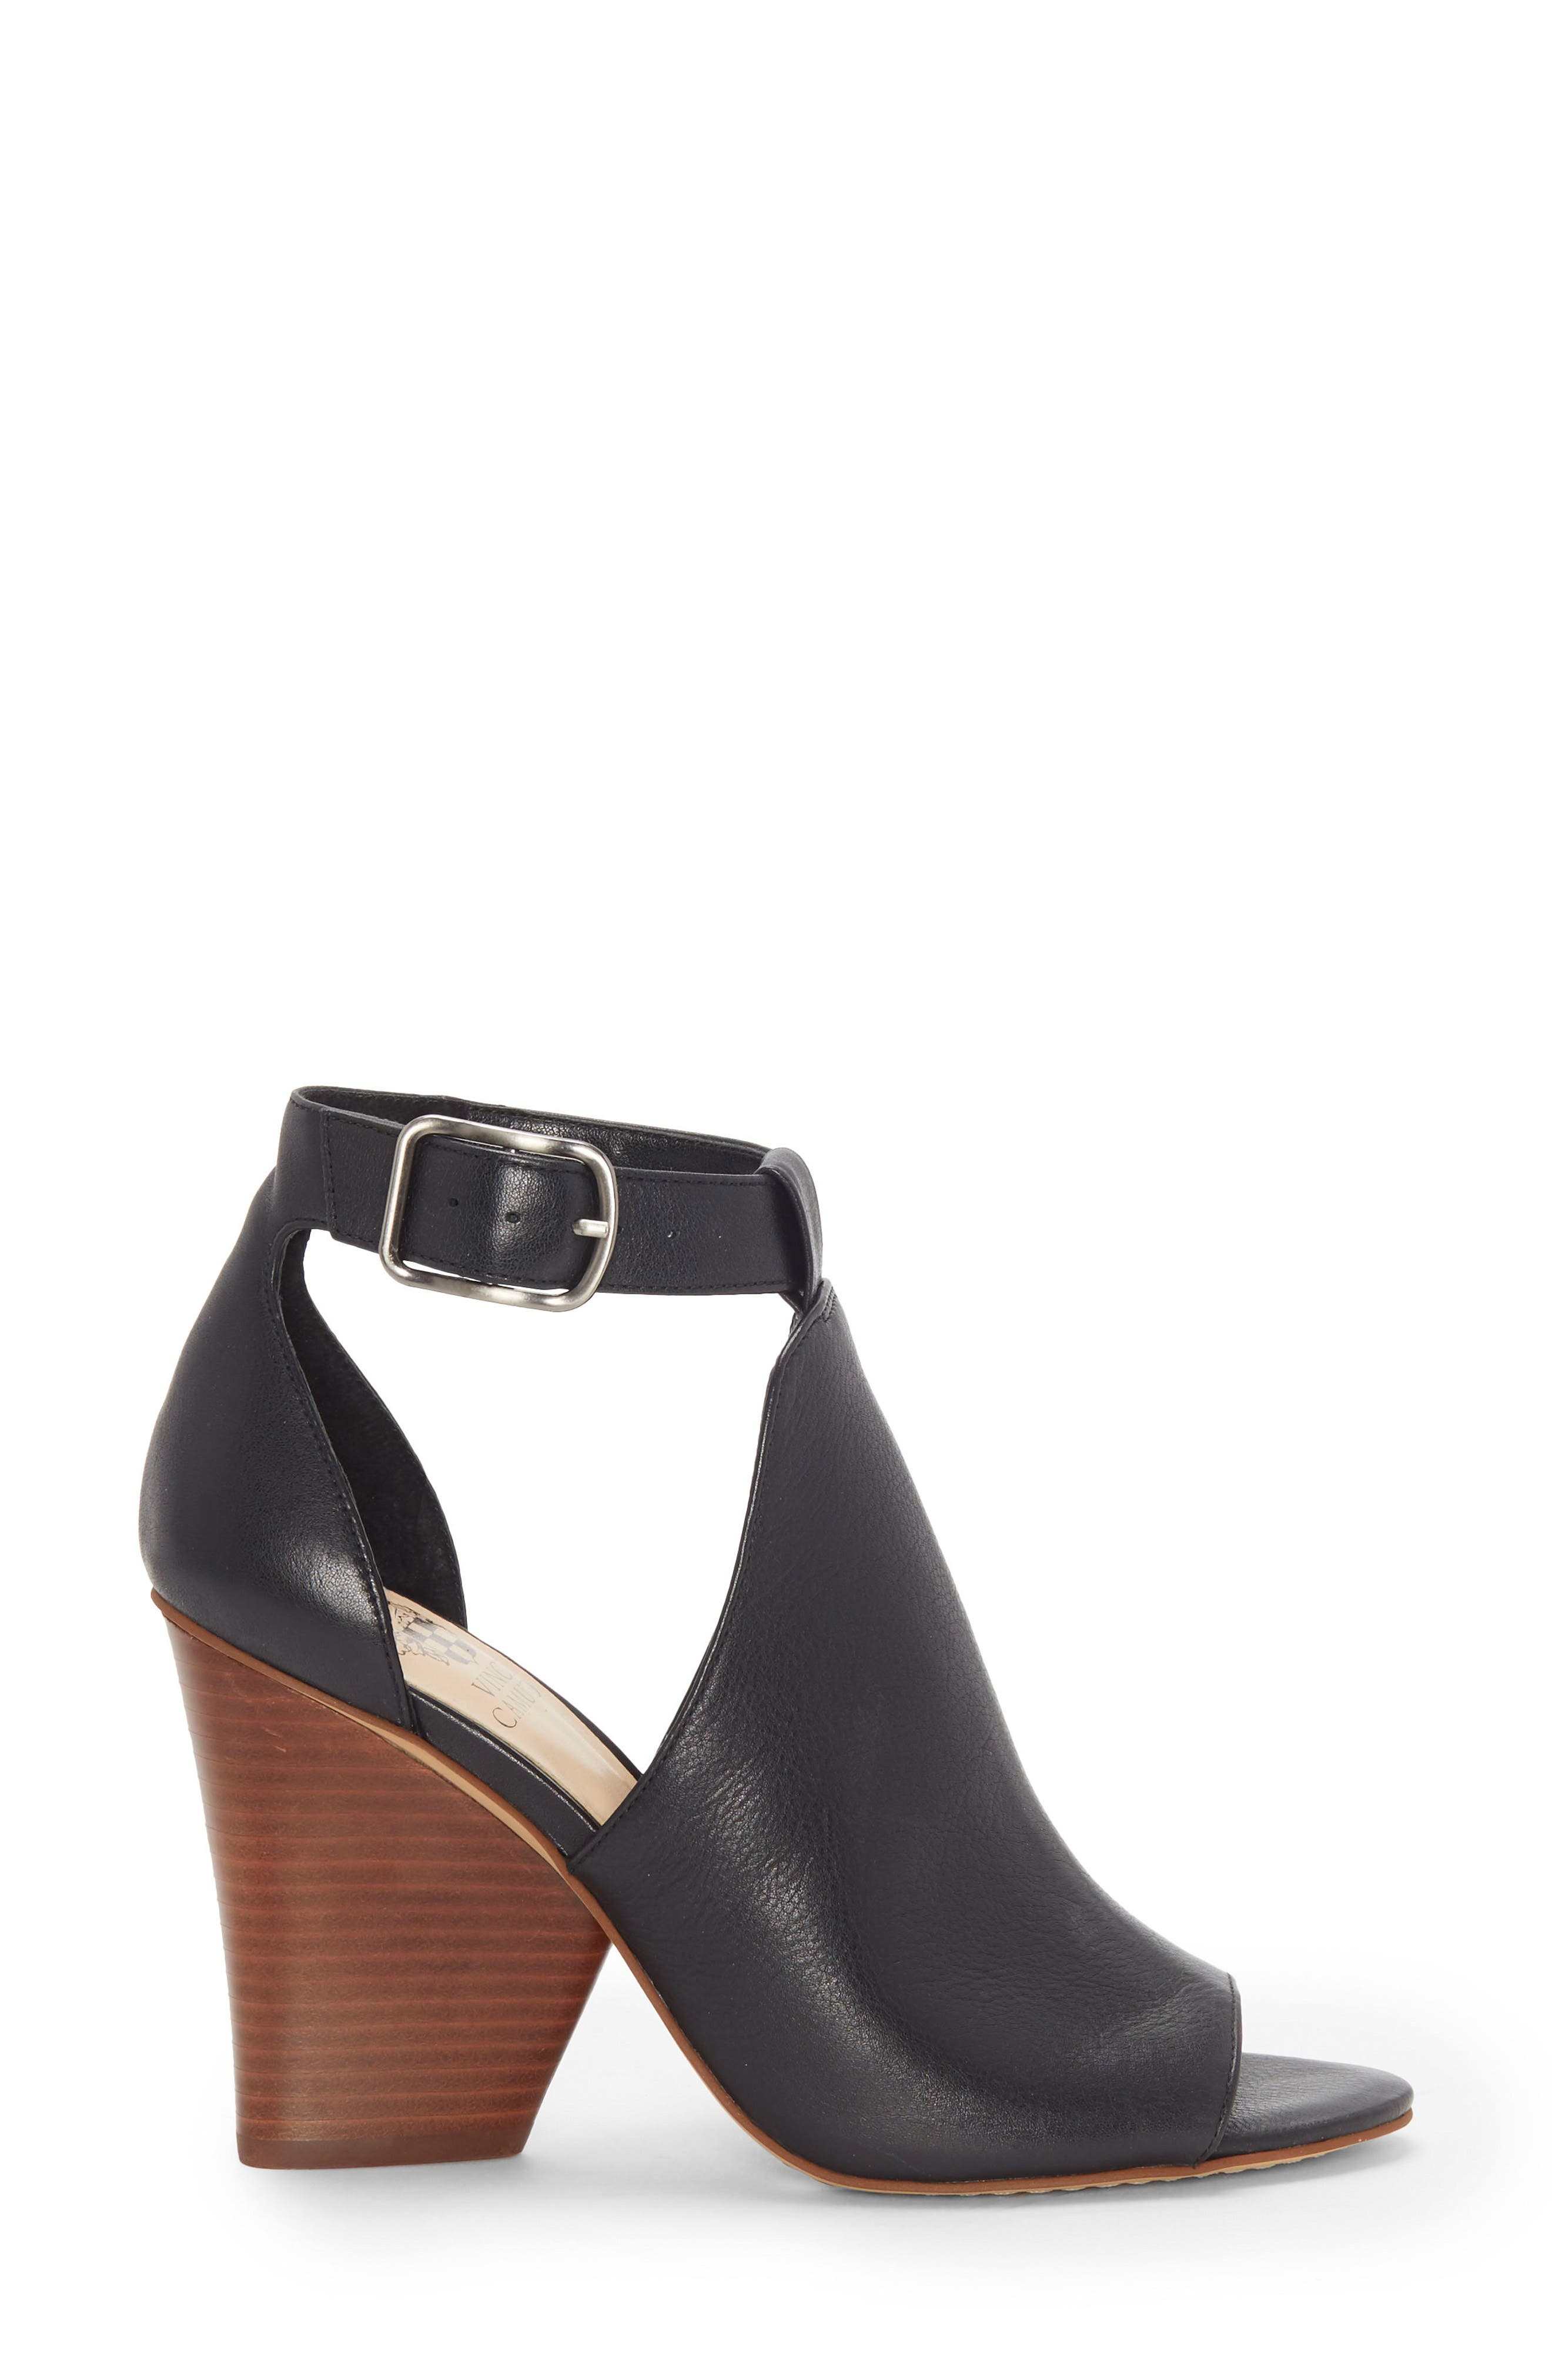 Adaren Peep Toe Sandal,                             Alternate thumbnail 3, color,                             BLACK LEATHER